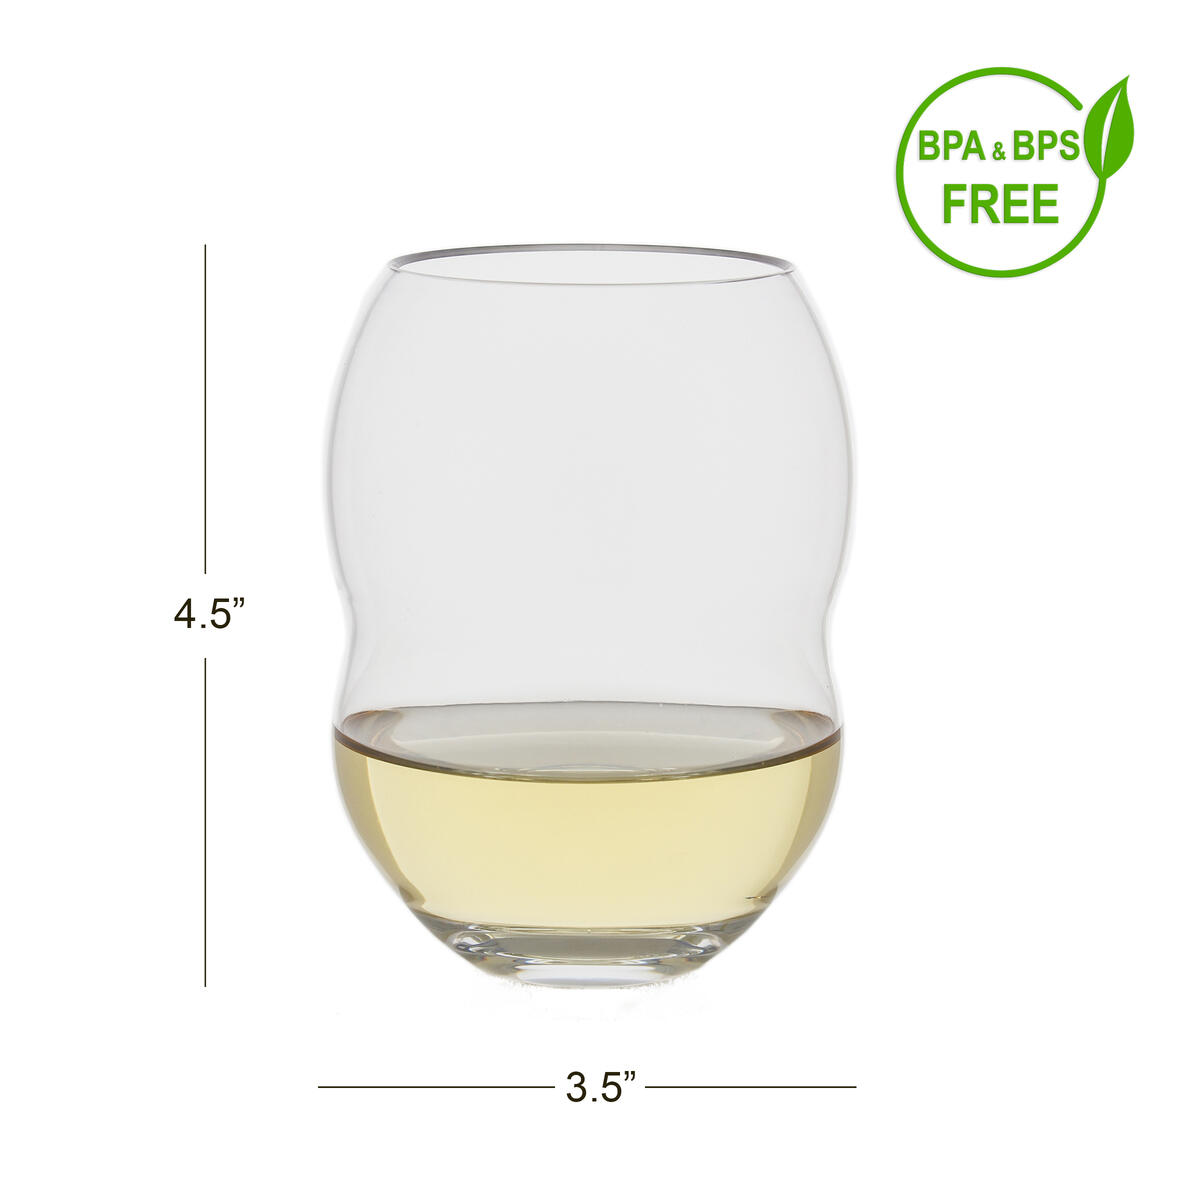 Stemless Plastic Wine Glasses - Set of 4